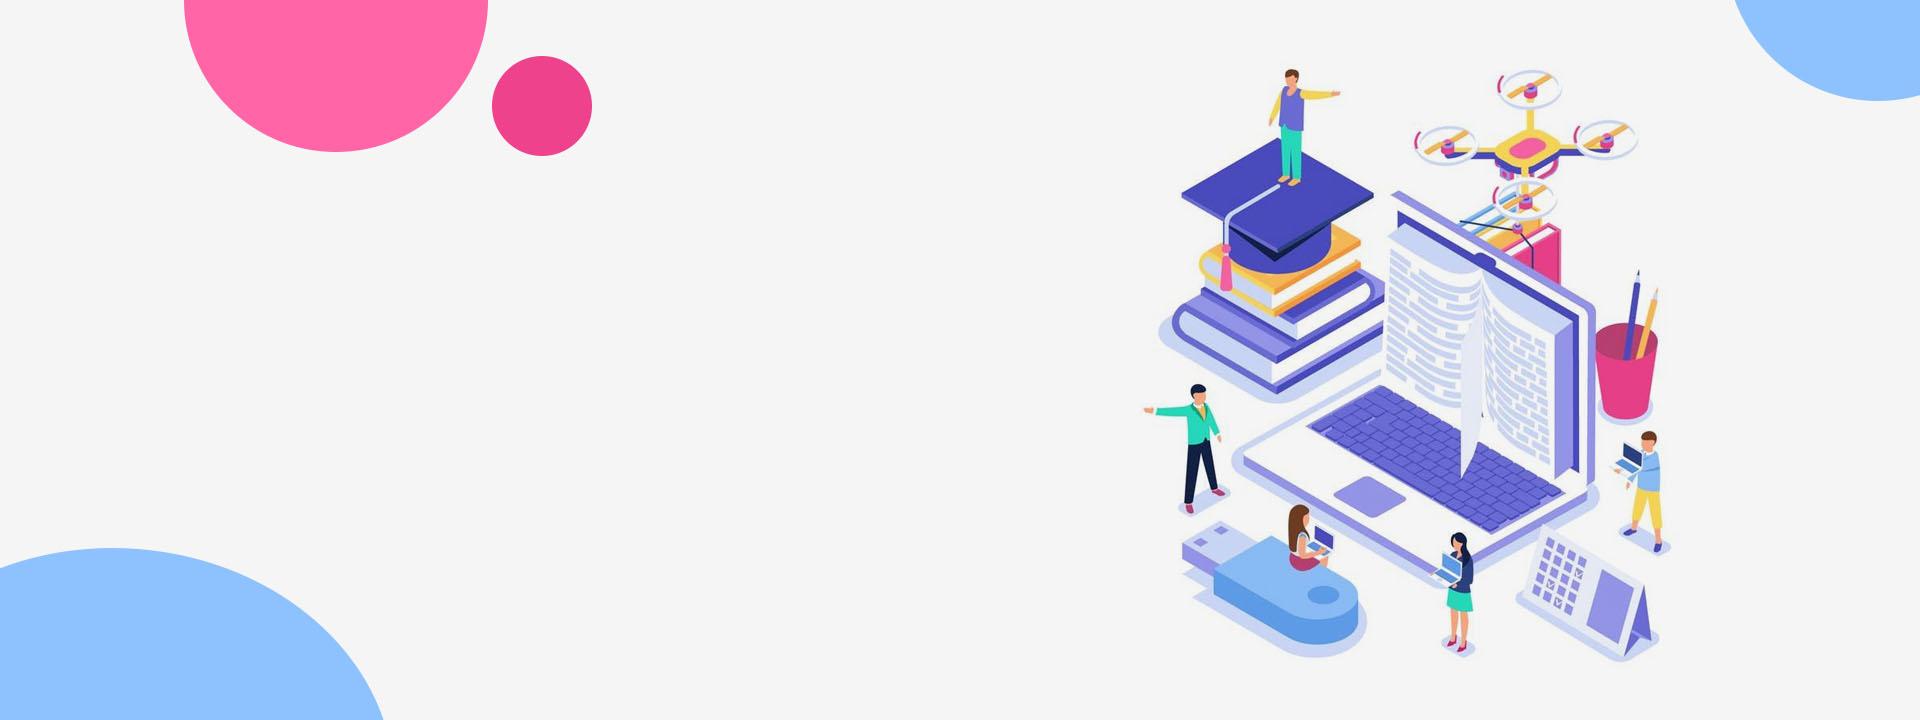 iStarto教育行业解决方案-banner001